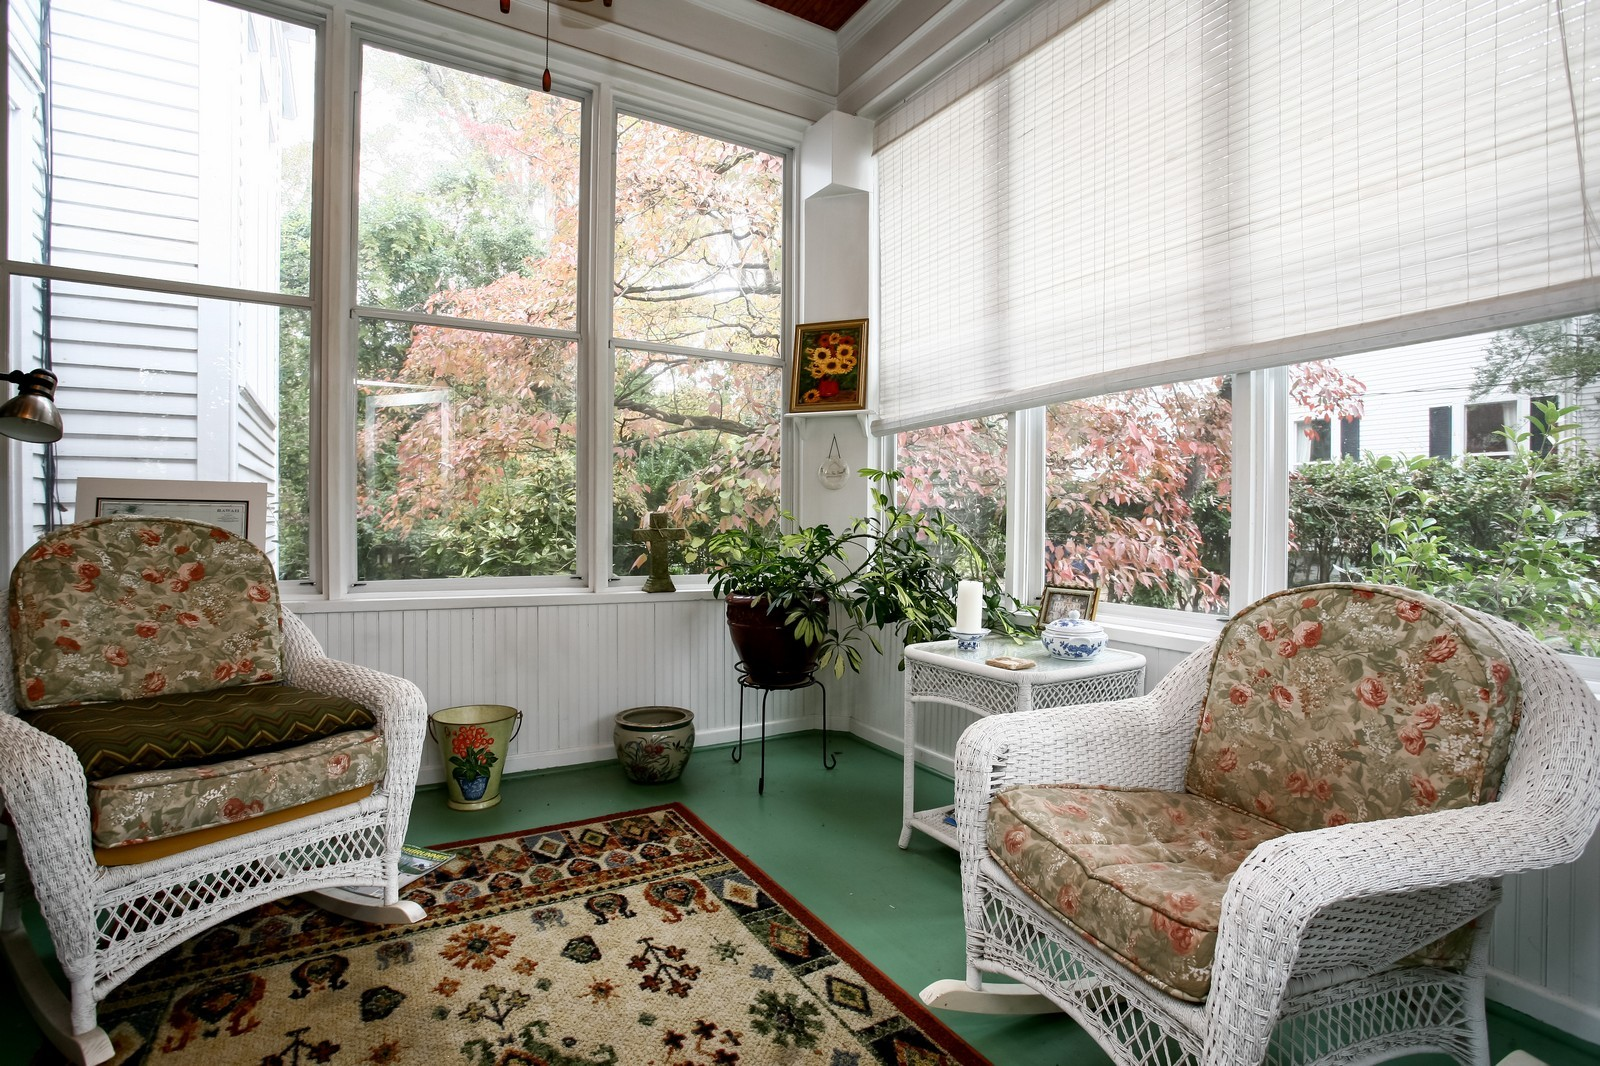 Real Estate Photography - 414 N 14th St, Lanett, AL, 36863 - Sun Room